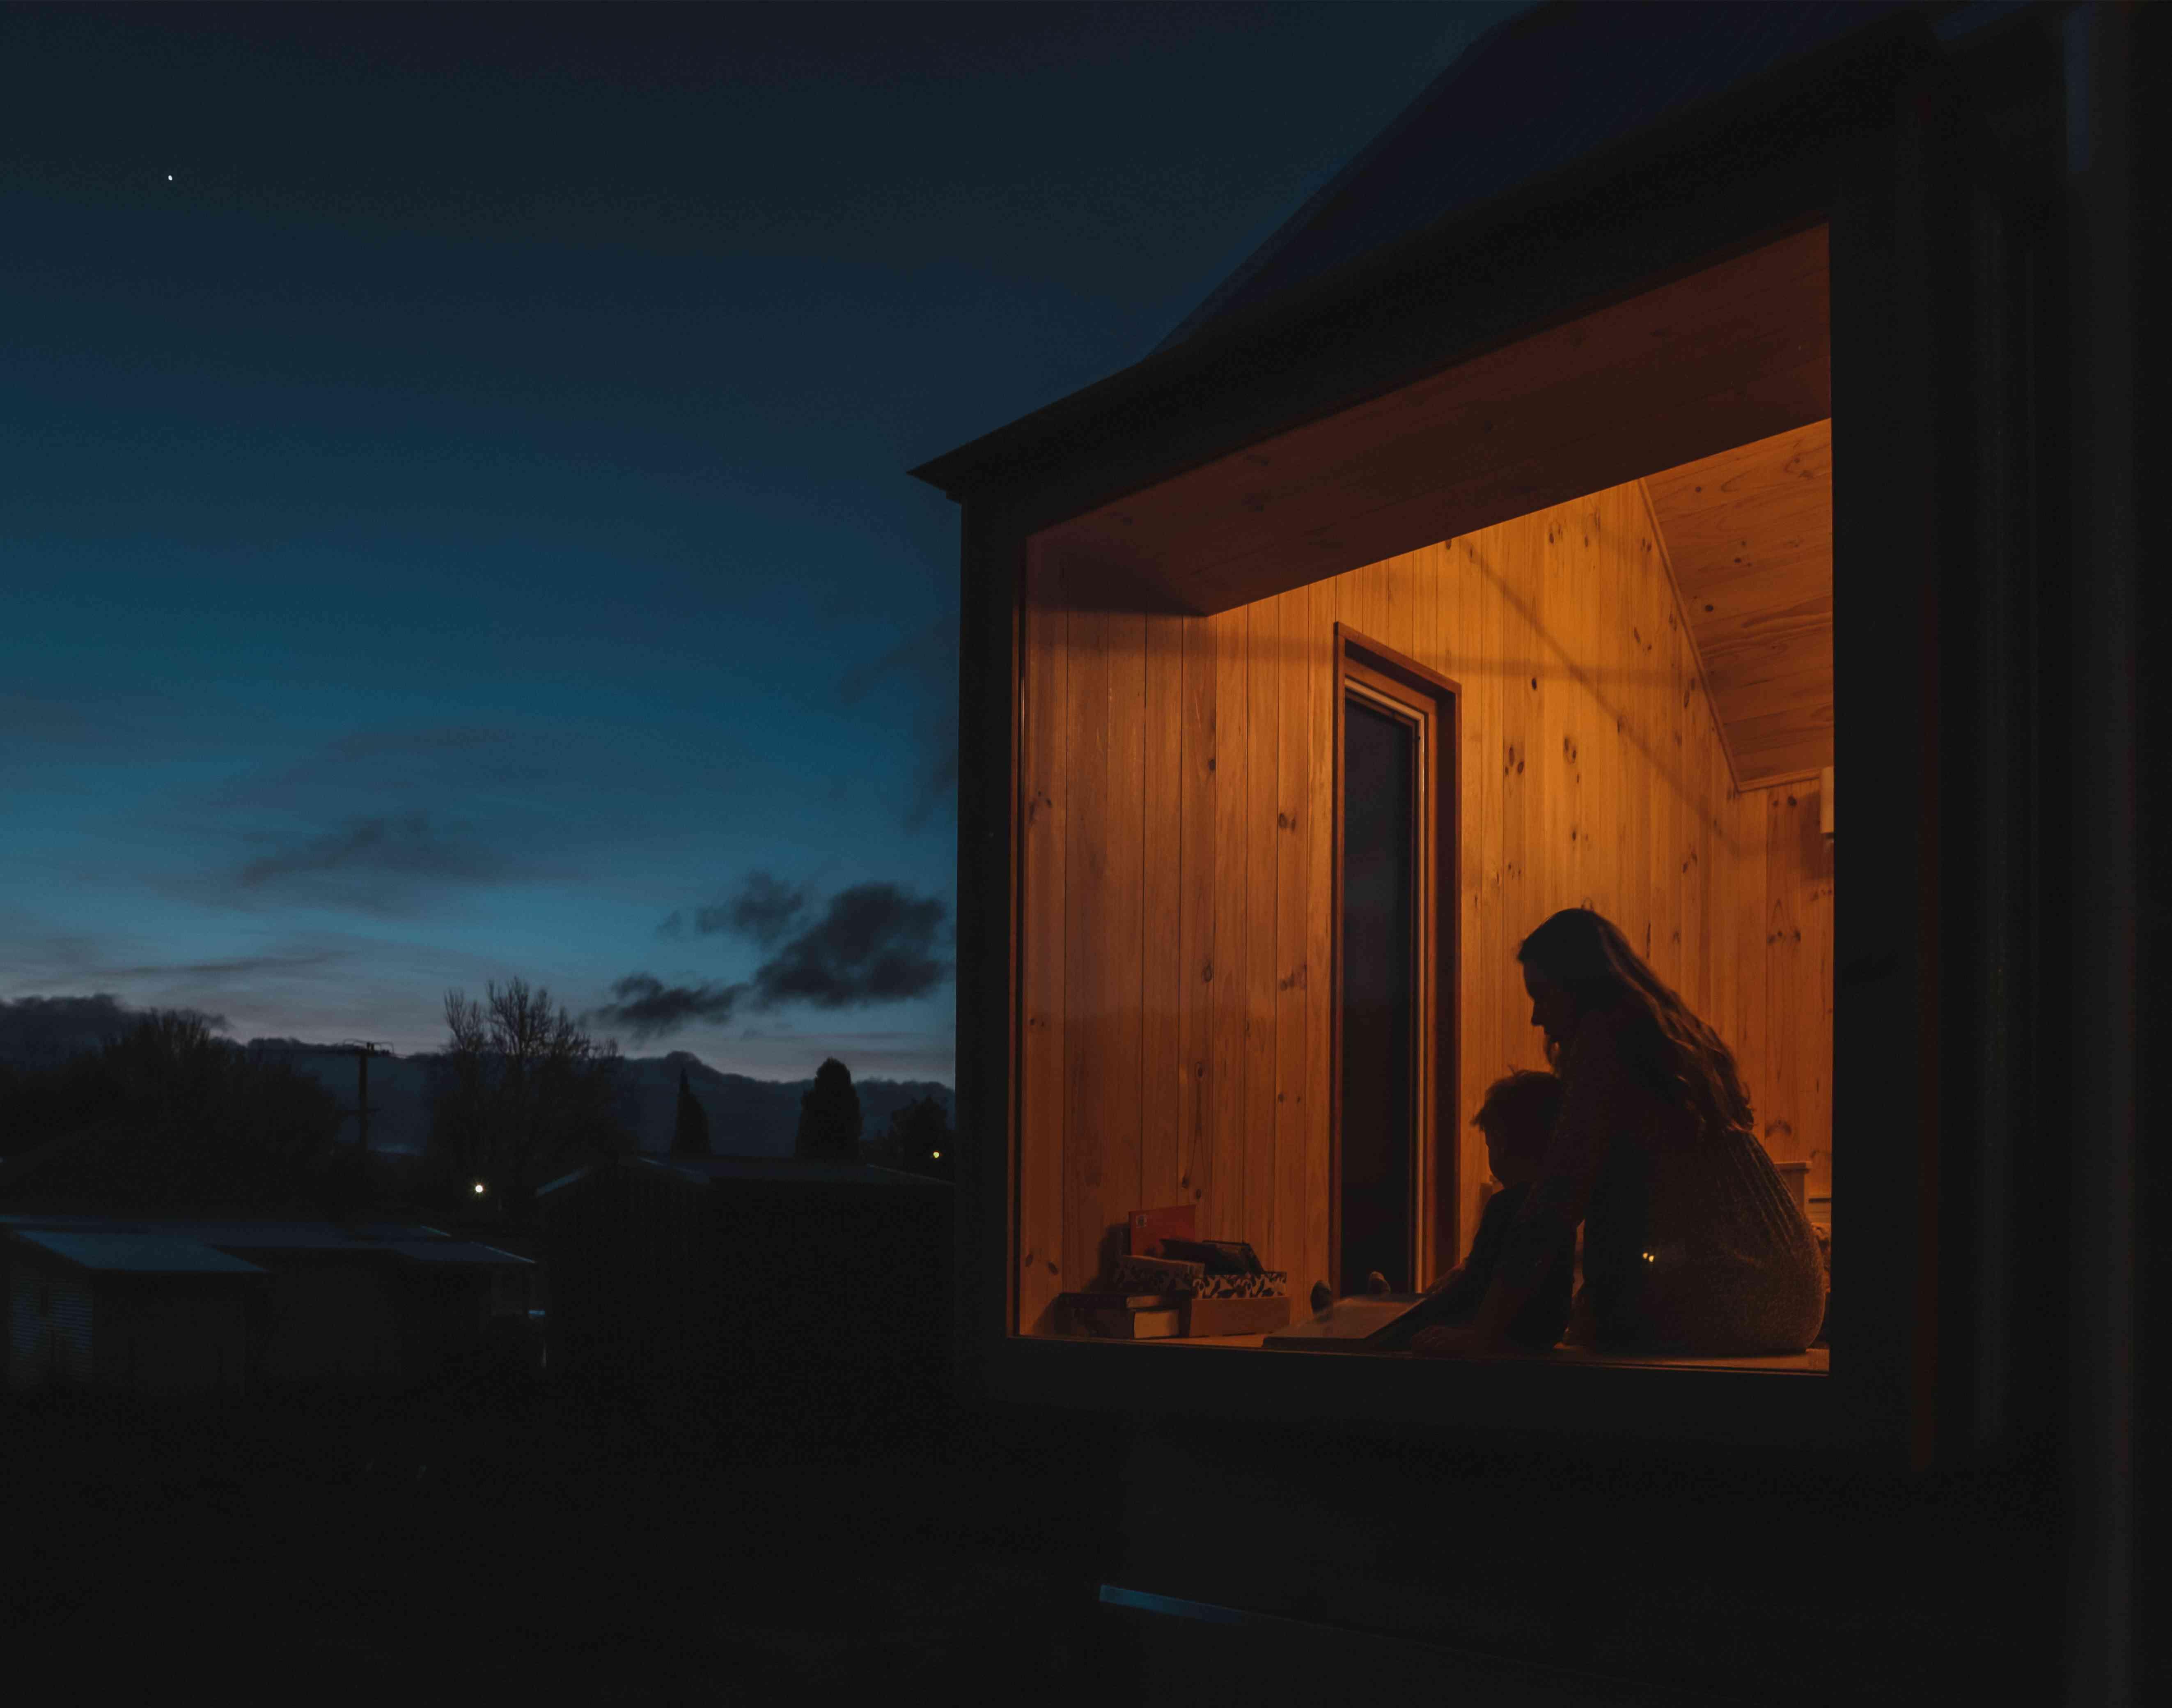 Tasmanian house at night